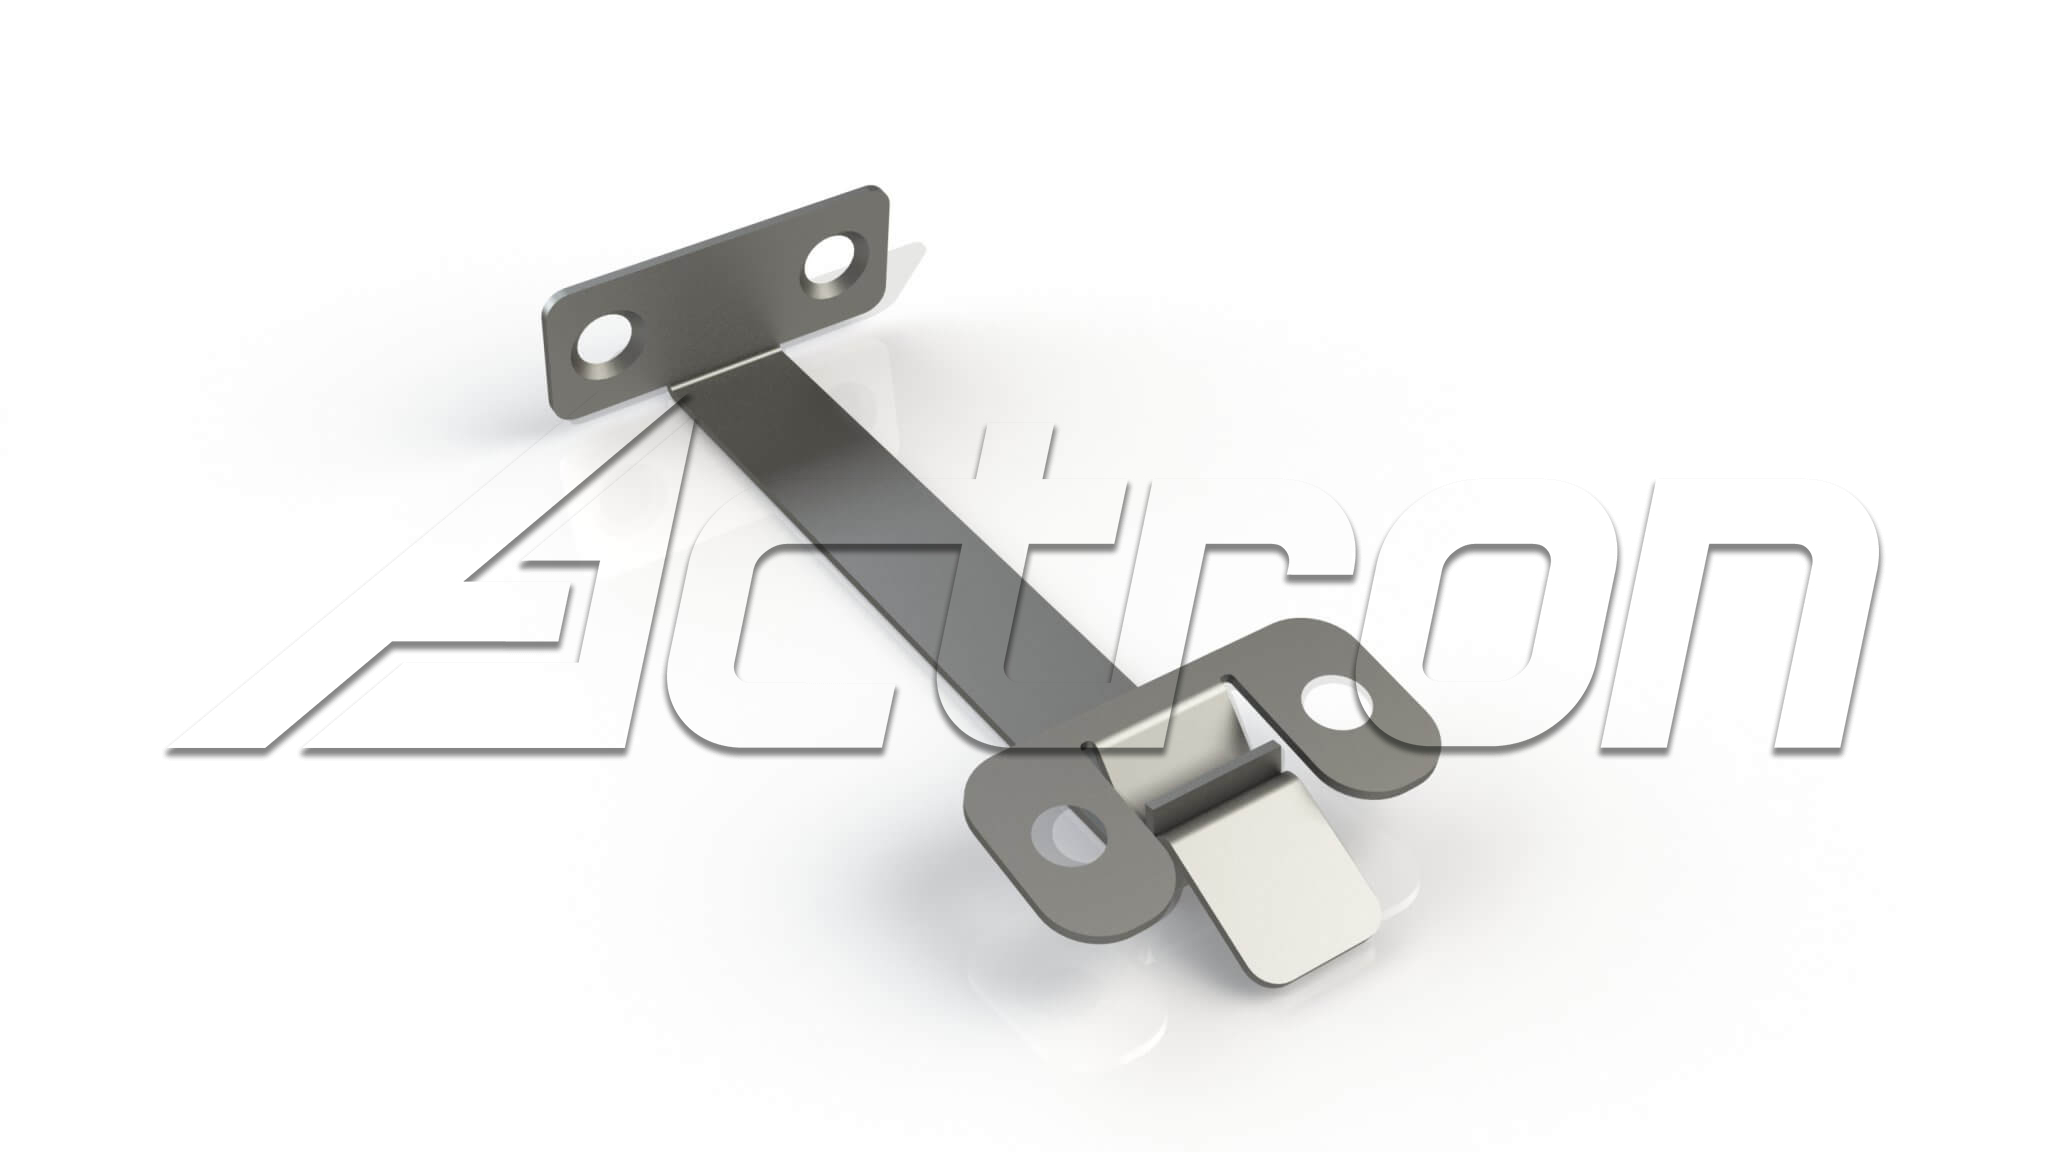 drawer-stop-5556-a2150.jpg